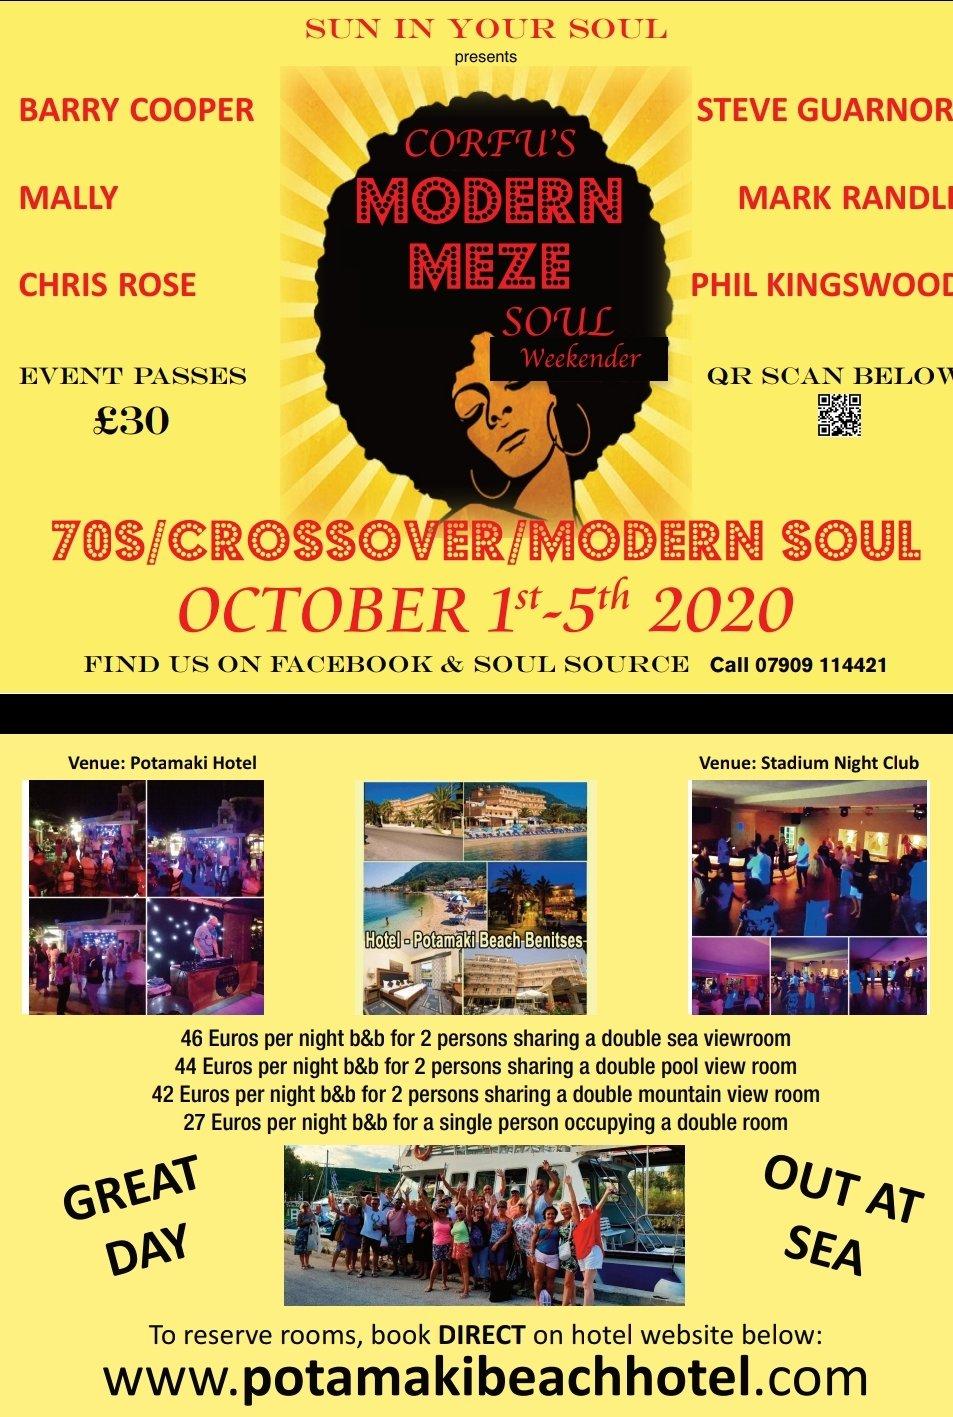 Corfus Modern Meze Weekender 2020 flyer